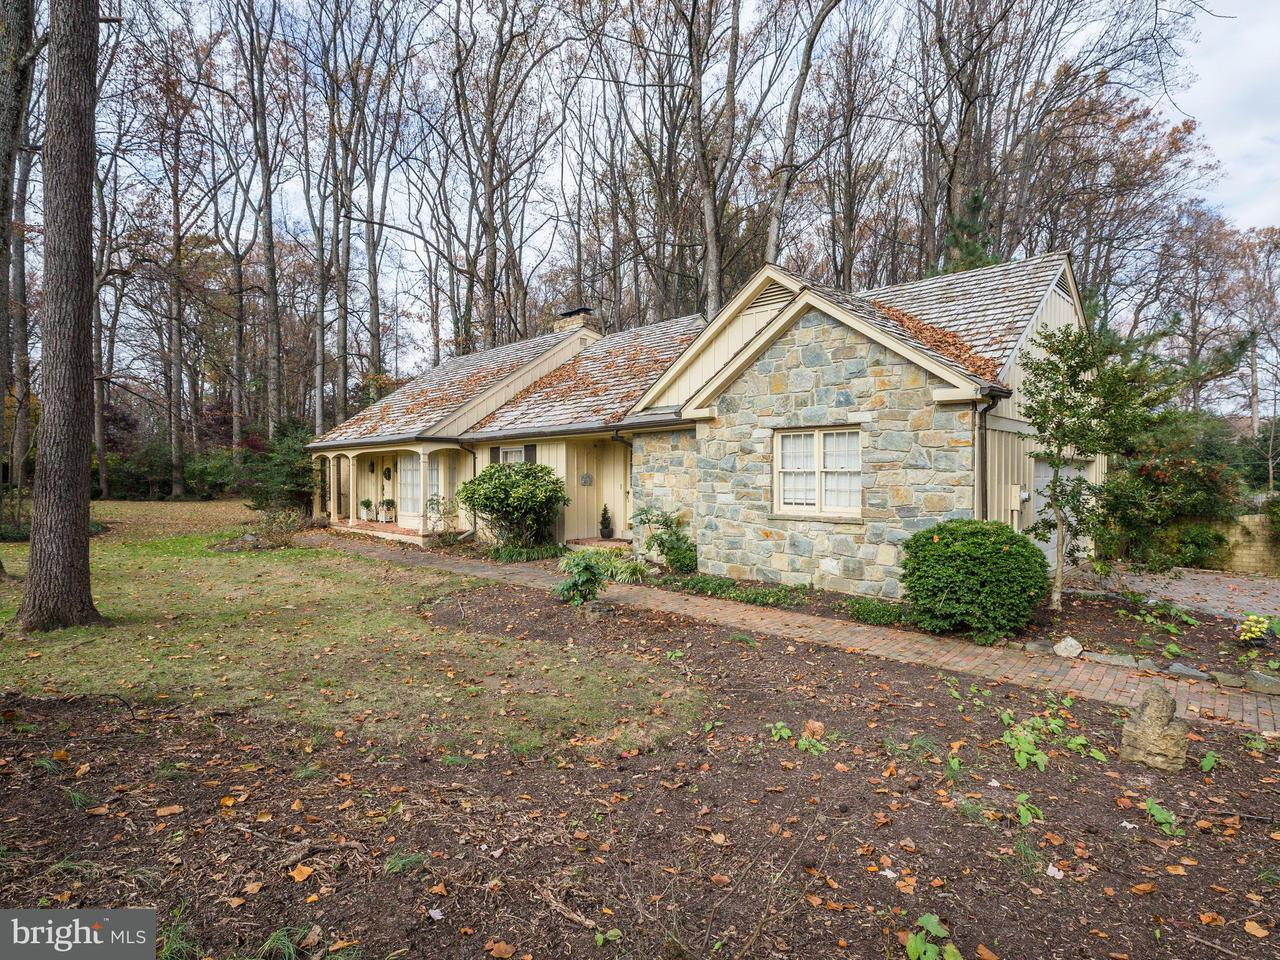 Land for Sale at 8430 BROOK Road 8430 BROOK Road McLean, Virginia 22102 United States